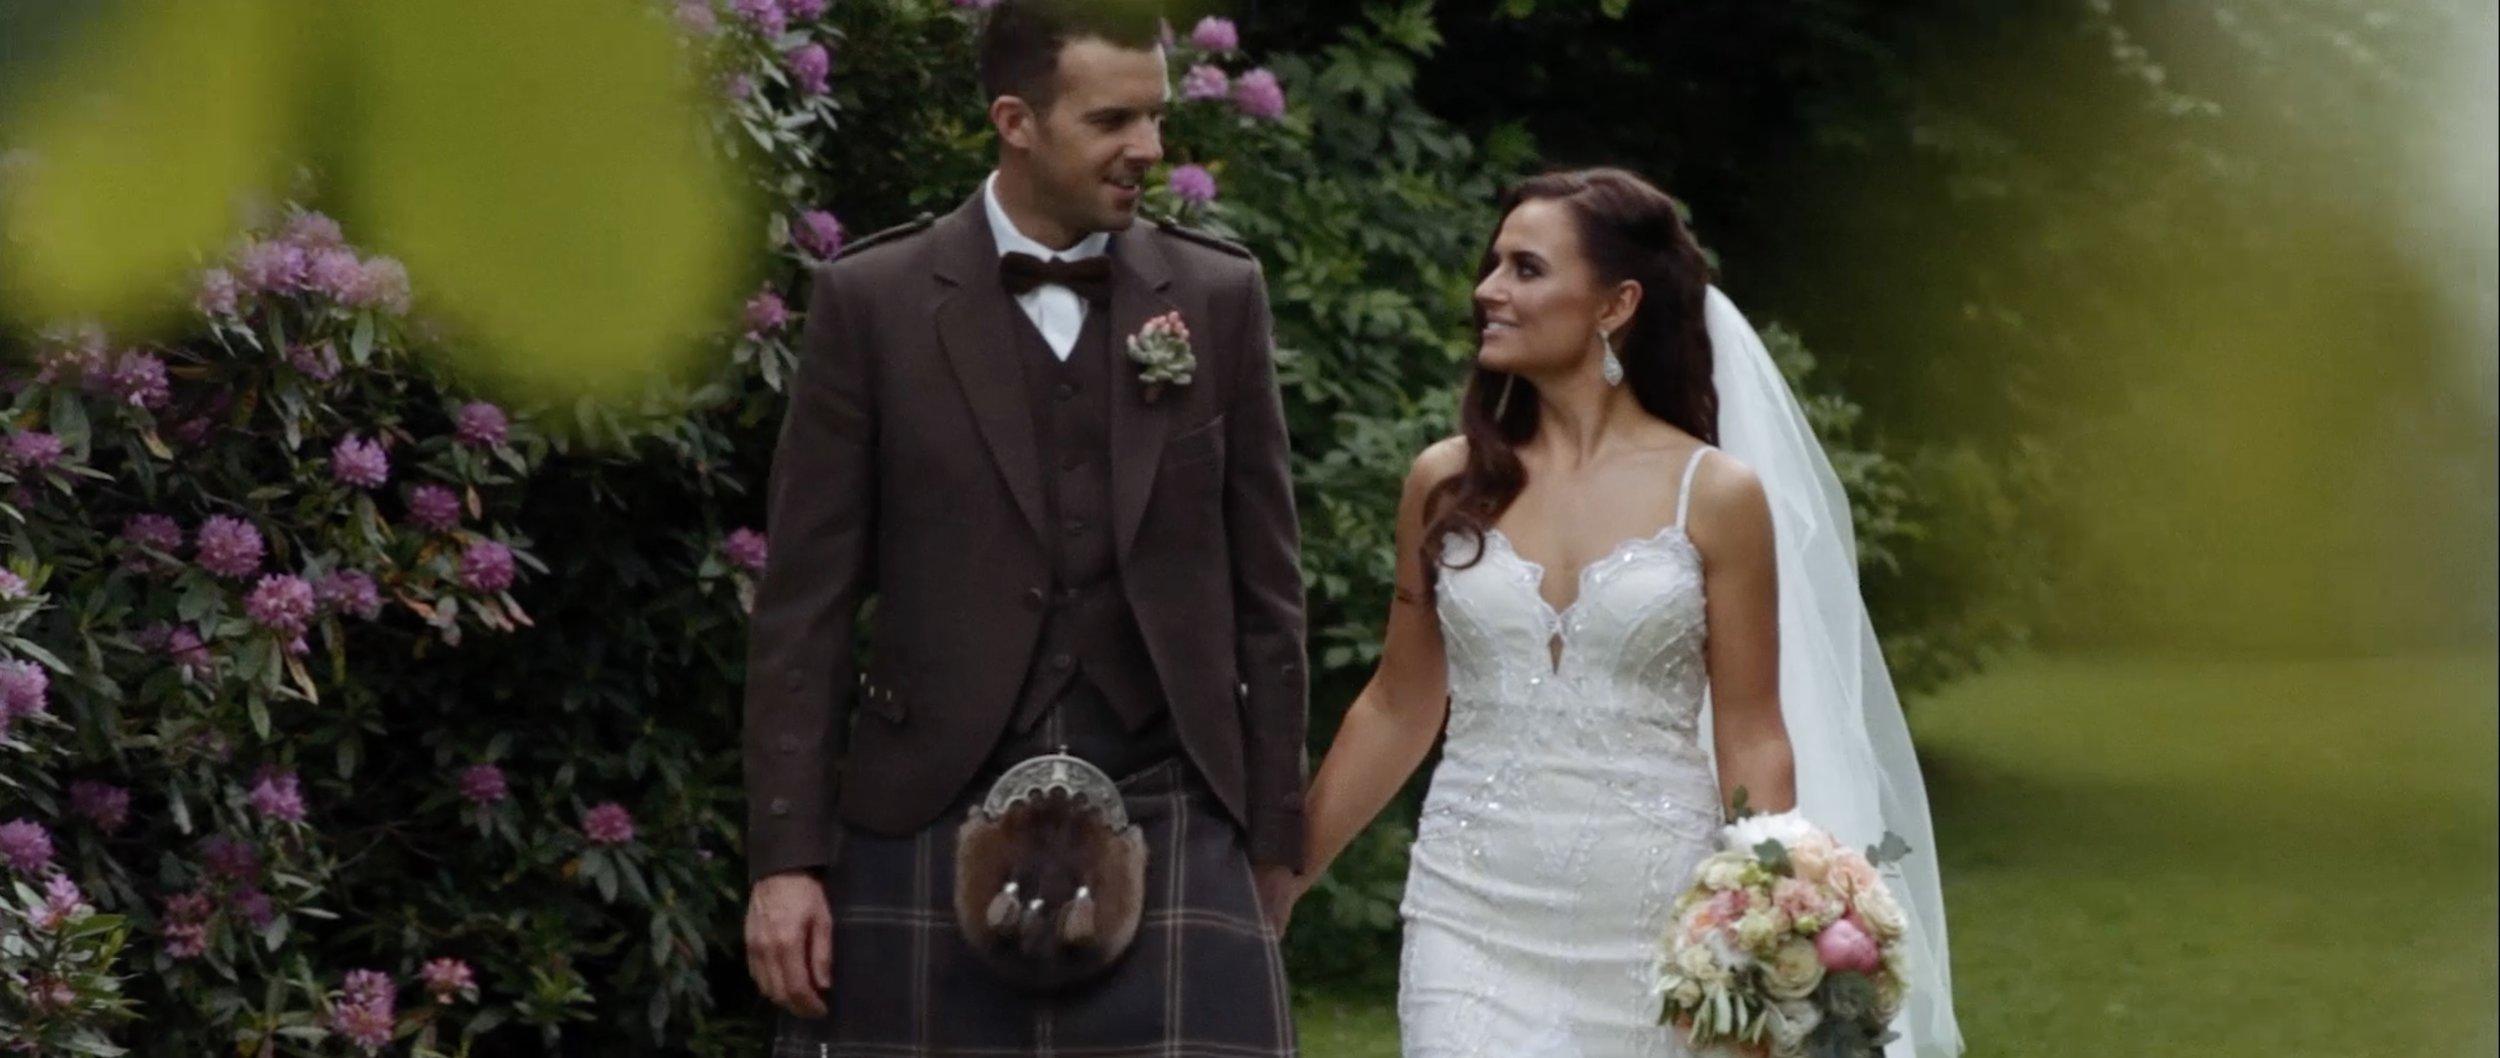 duns-castle-wedding-videographer_LL_06.jpg